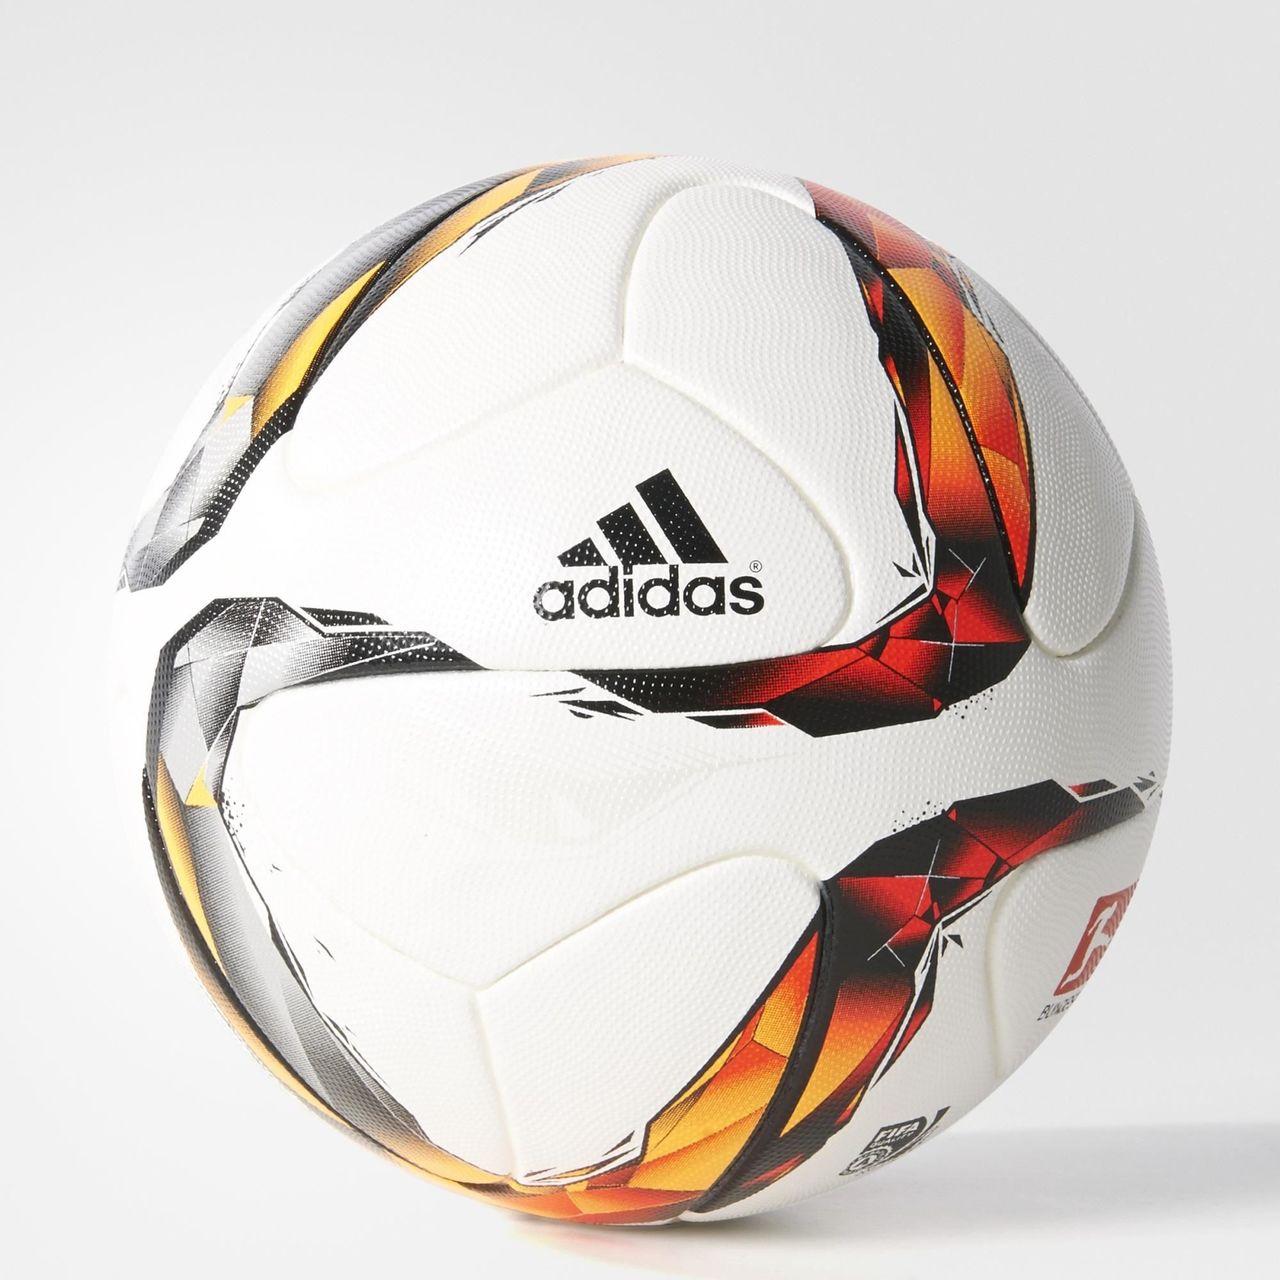 Adidas DFL Torfabrik Official Match Ball - White / Solar ...